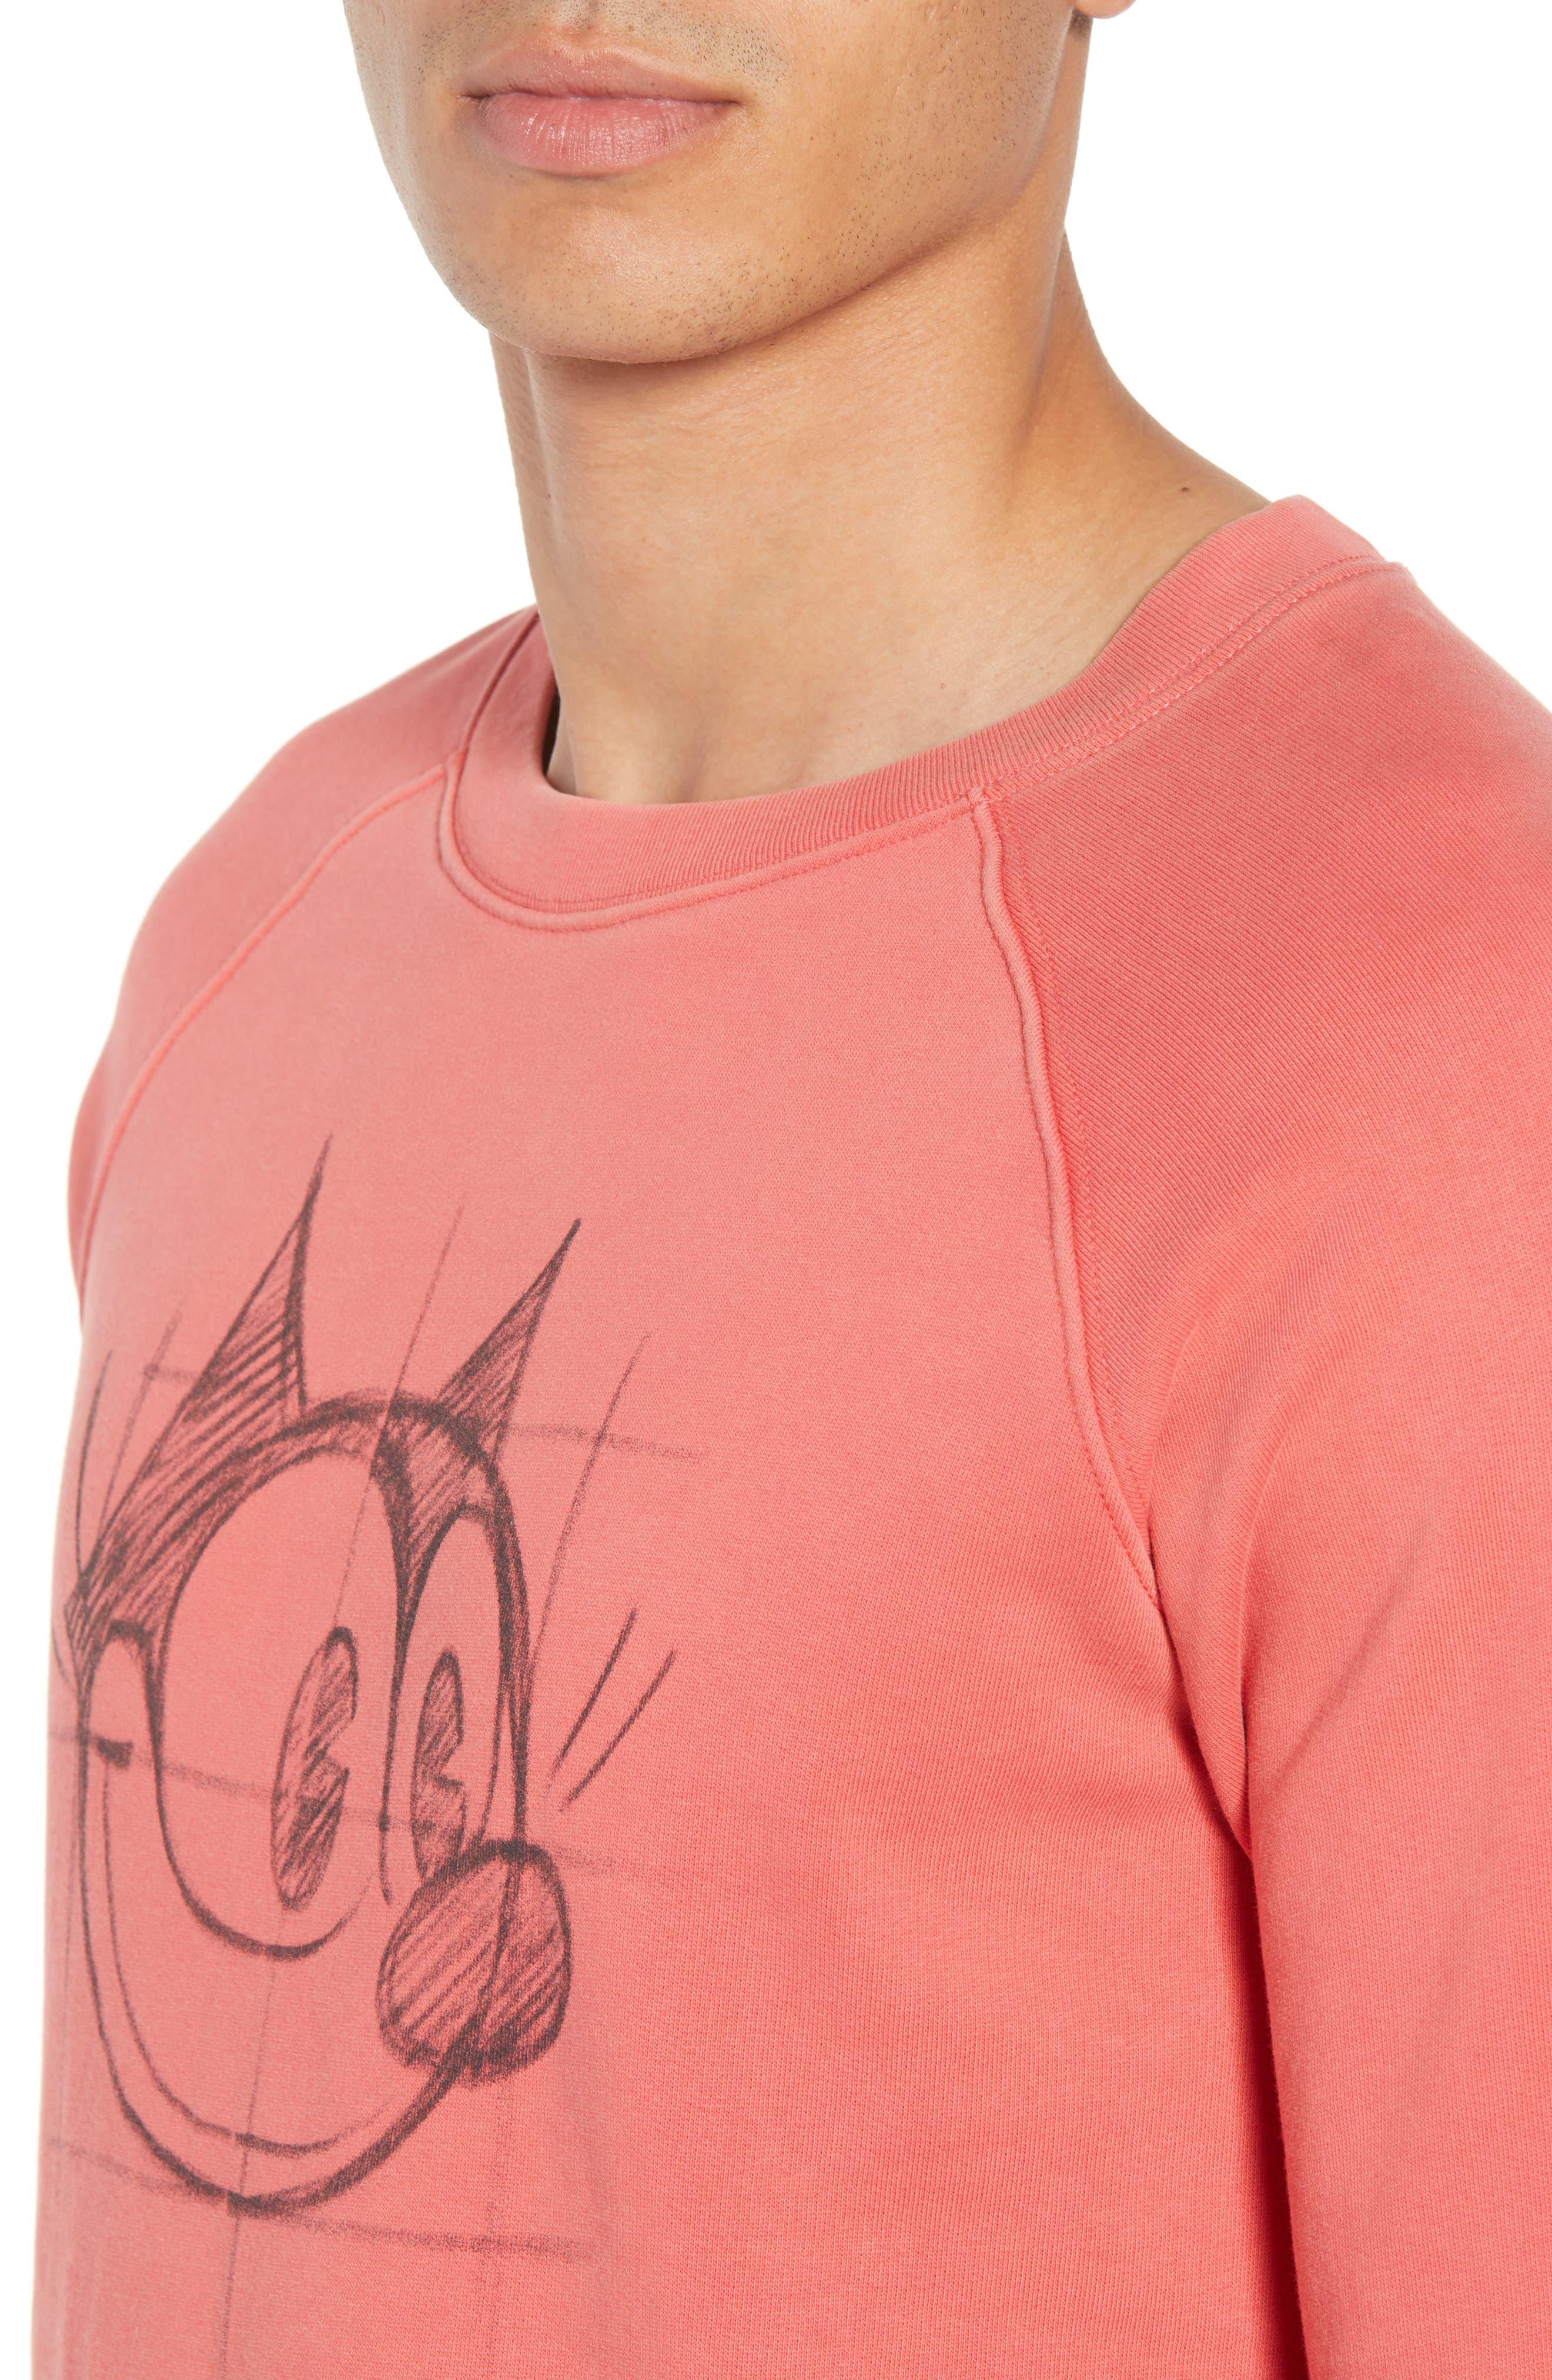 Amsterdams Blauw Felix the Cat Graphic Sweatshirt,                             Alternate thumbnail 4, color,                             RED GLOW